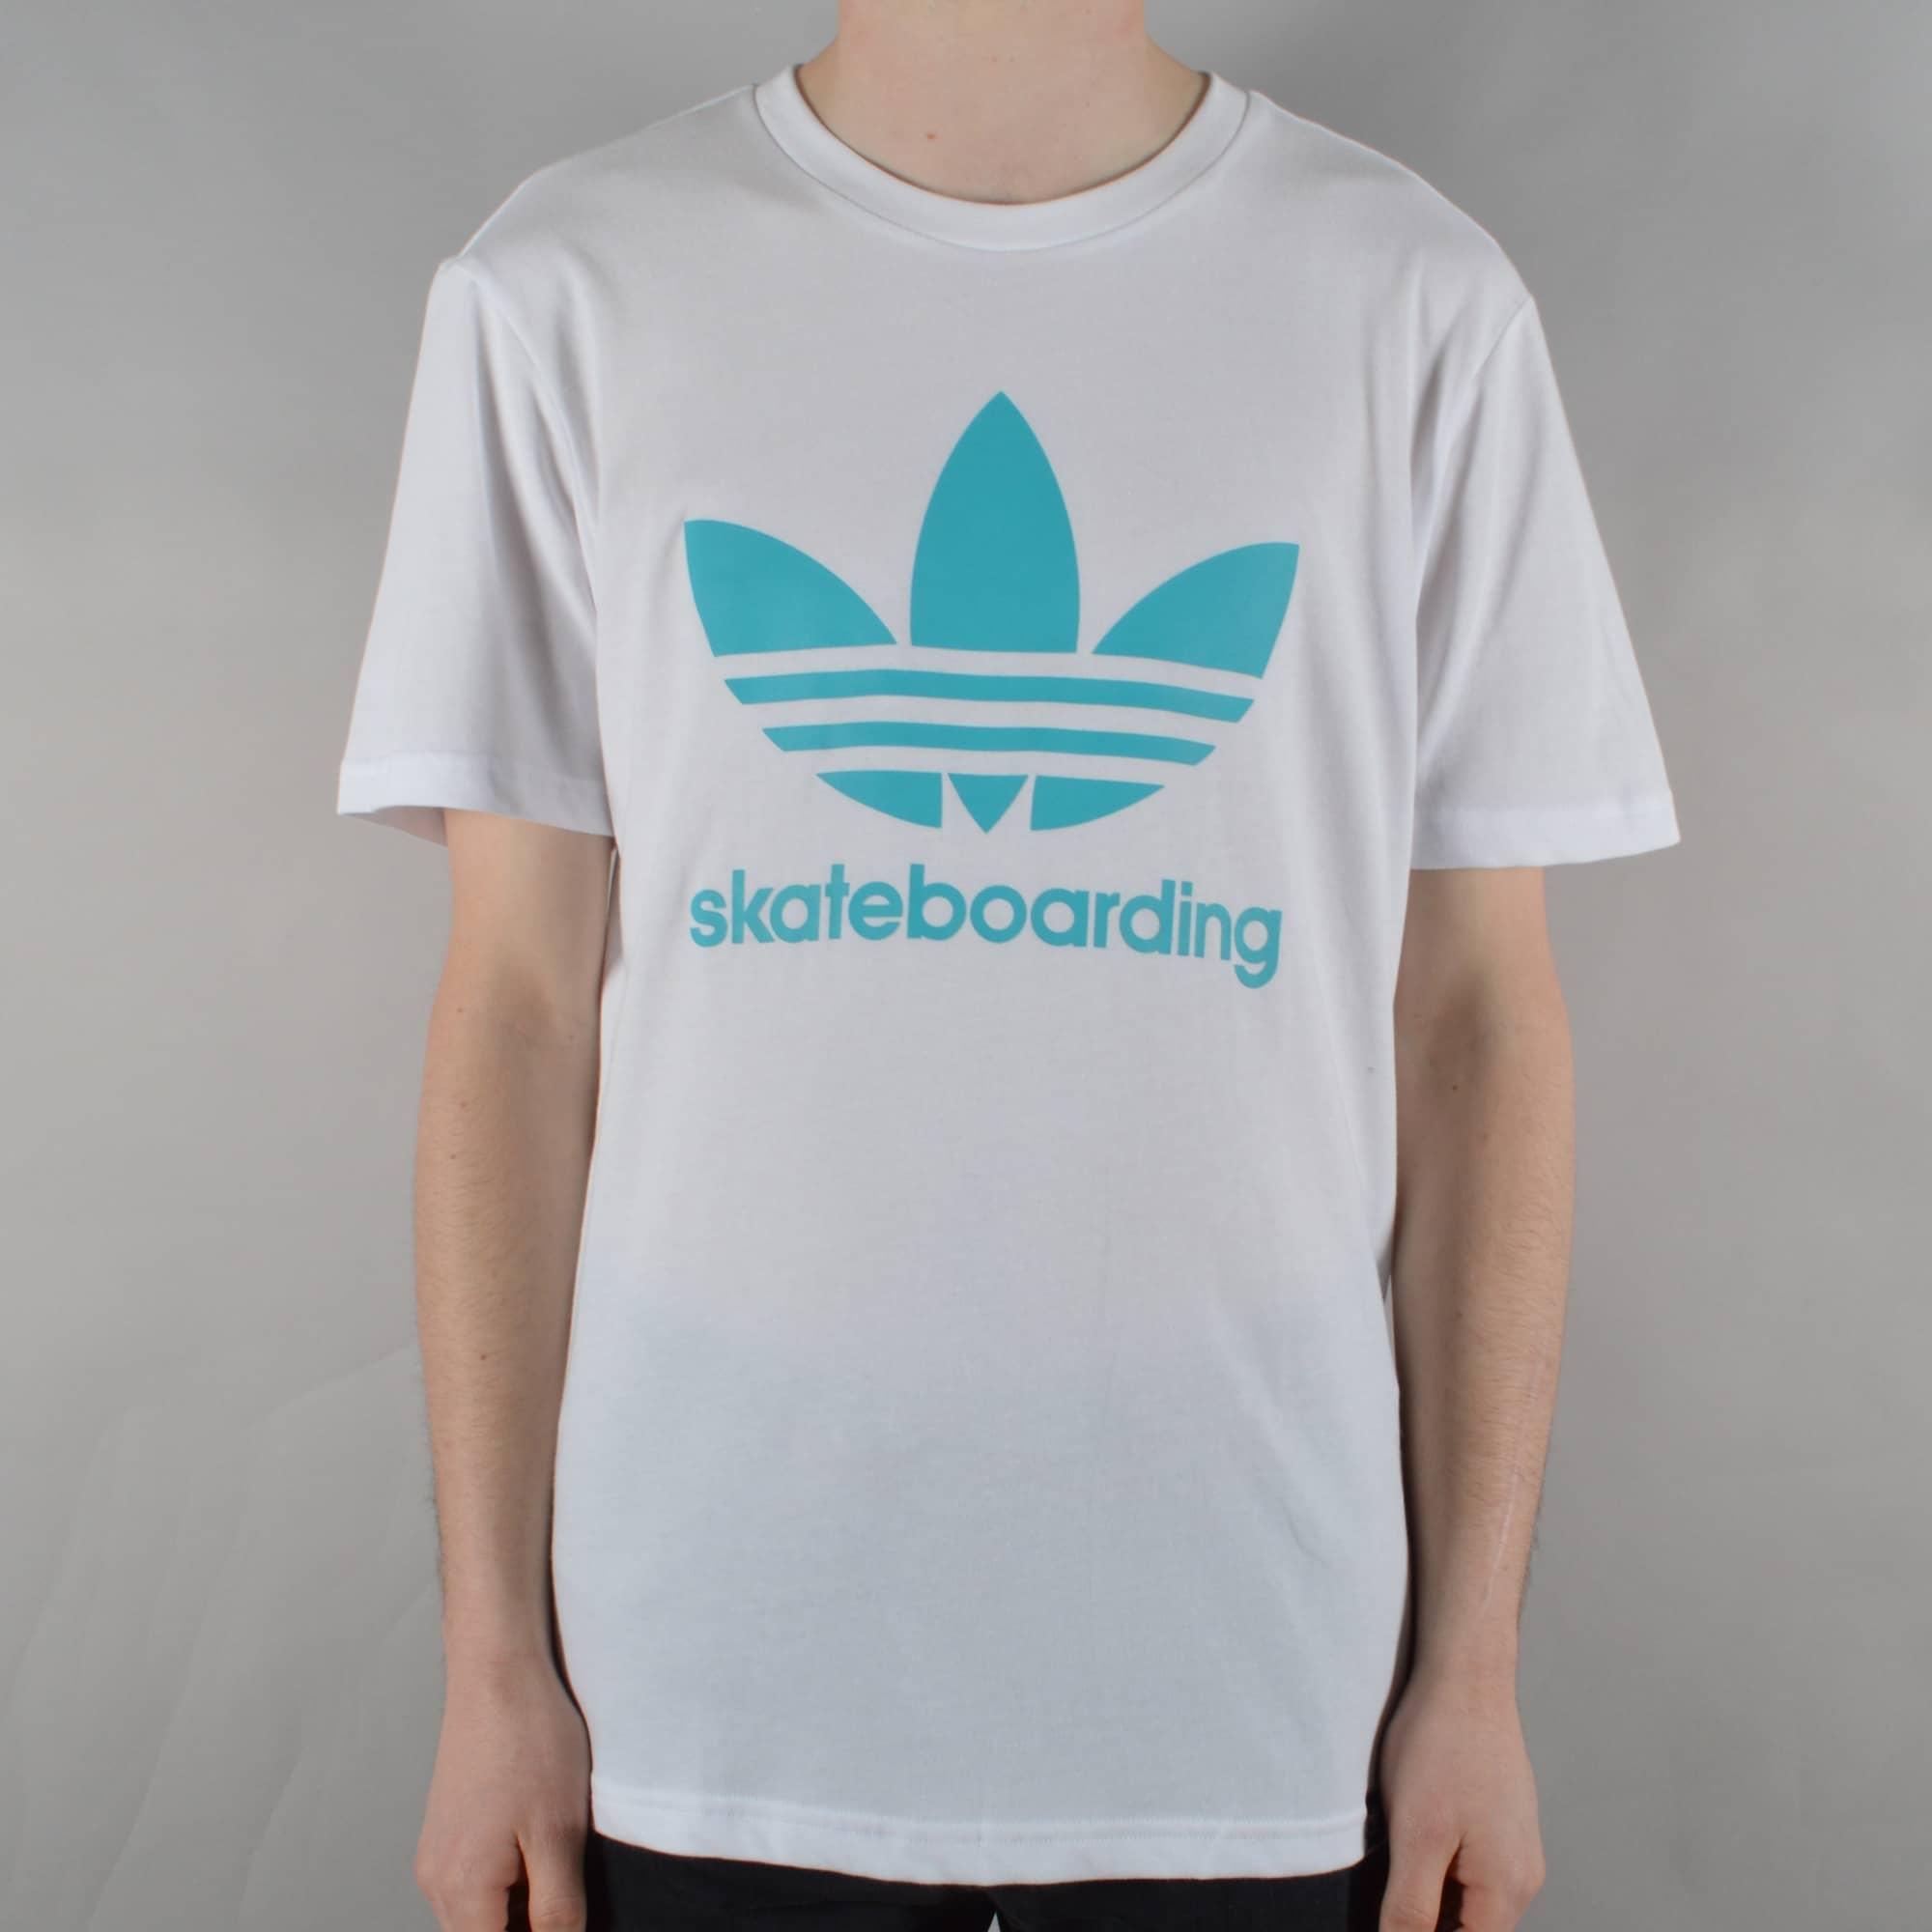 Adidas Skateboarding Clima 3.0 Skate T Shirt WhiteEnergy Blue